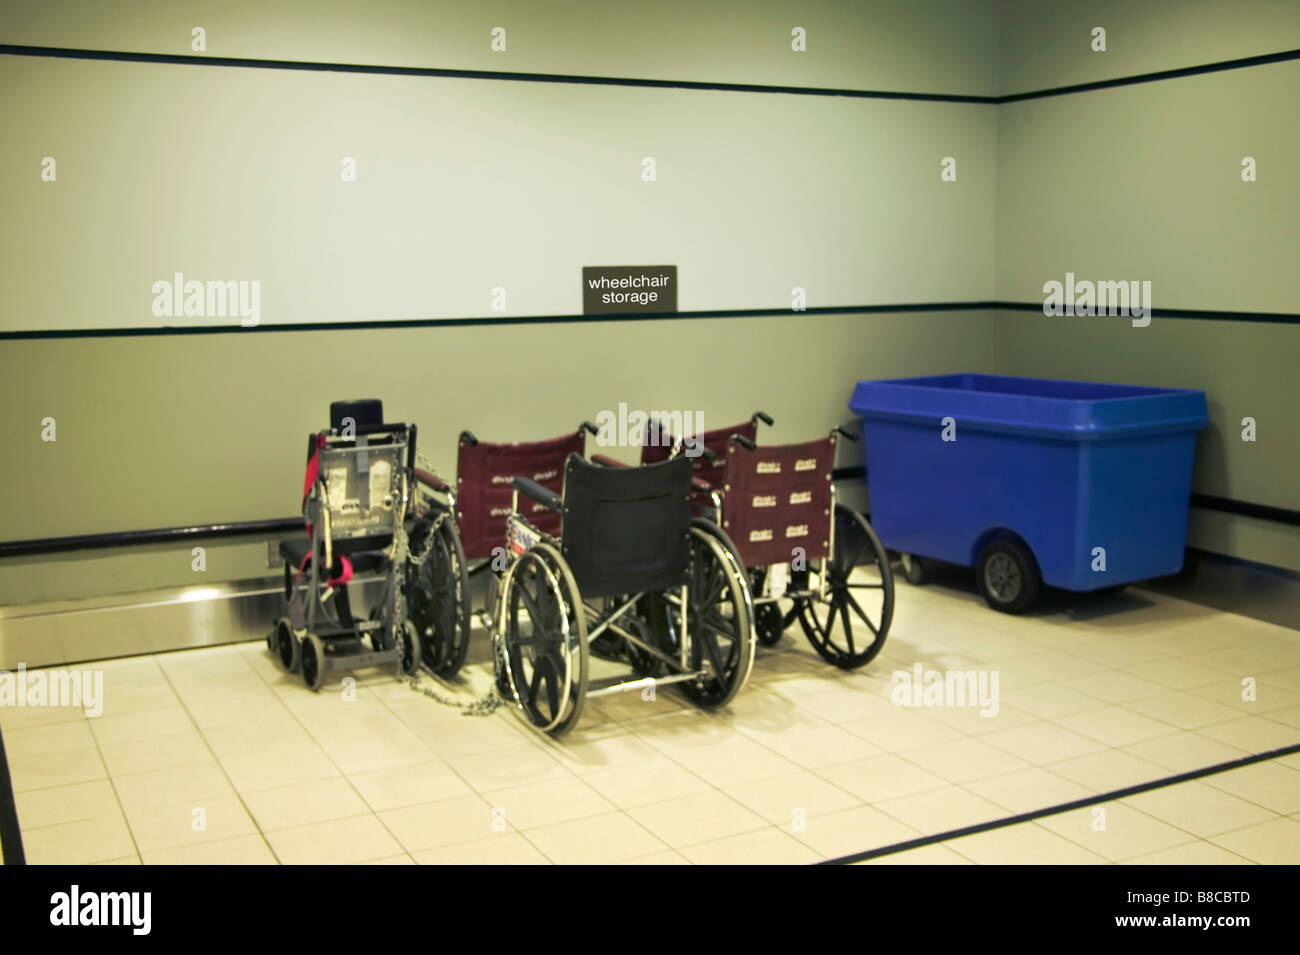 Wheelchair Storage Corner an Airport - Stock Image